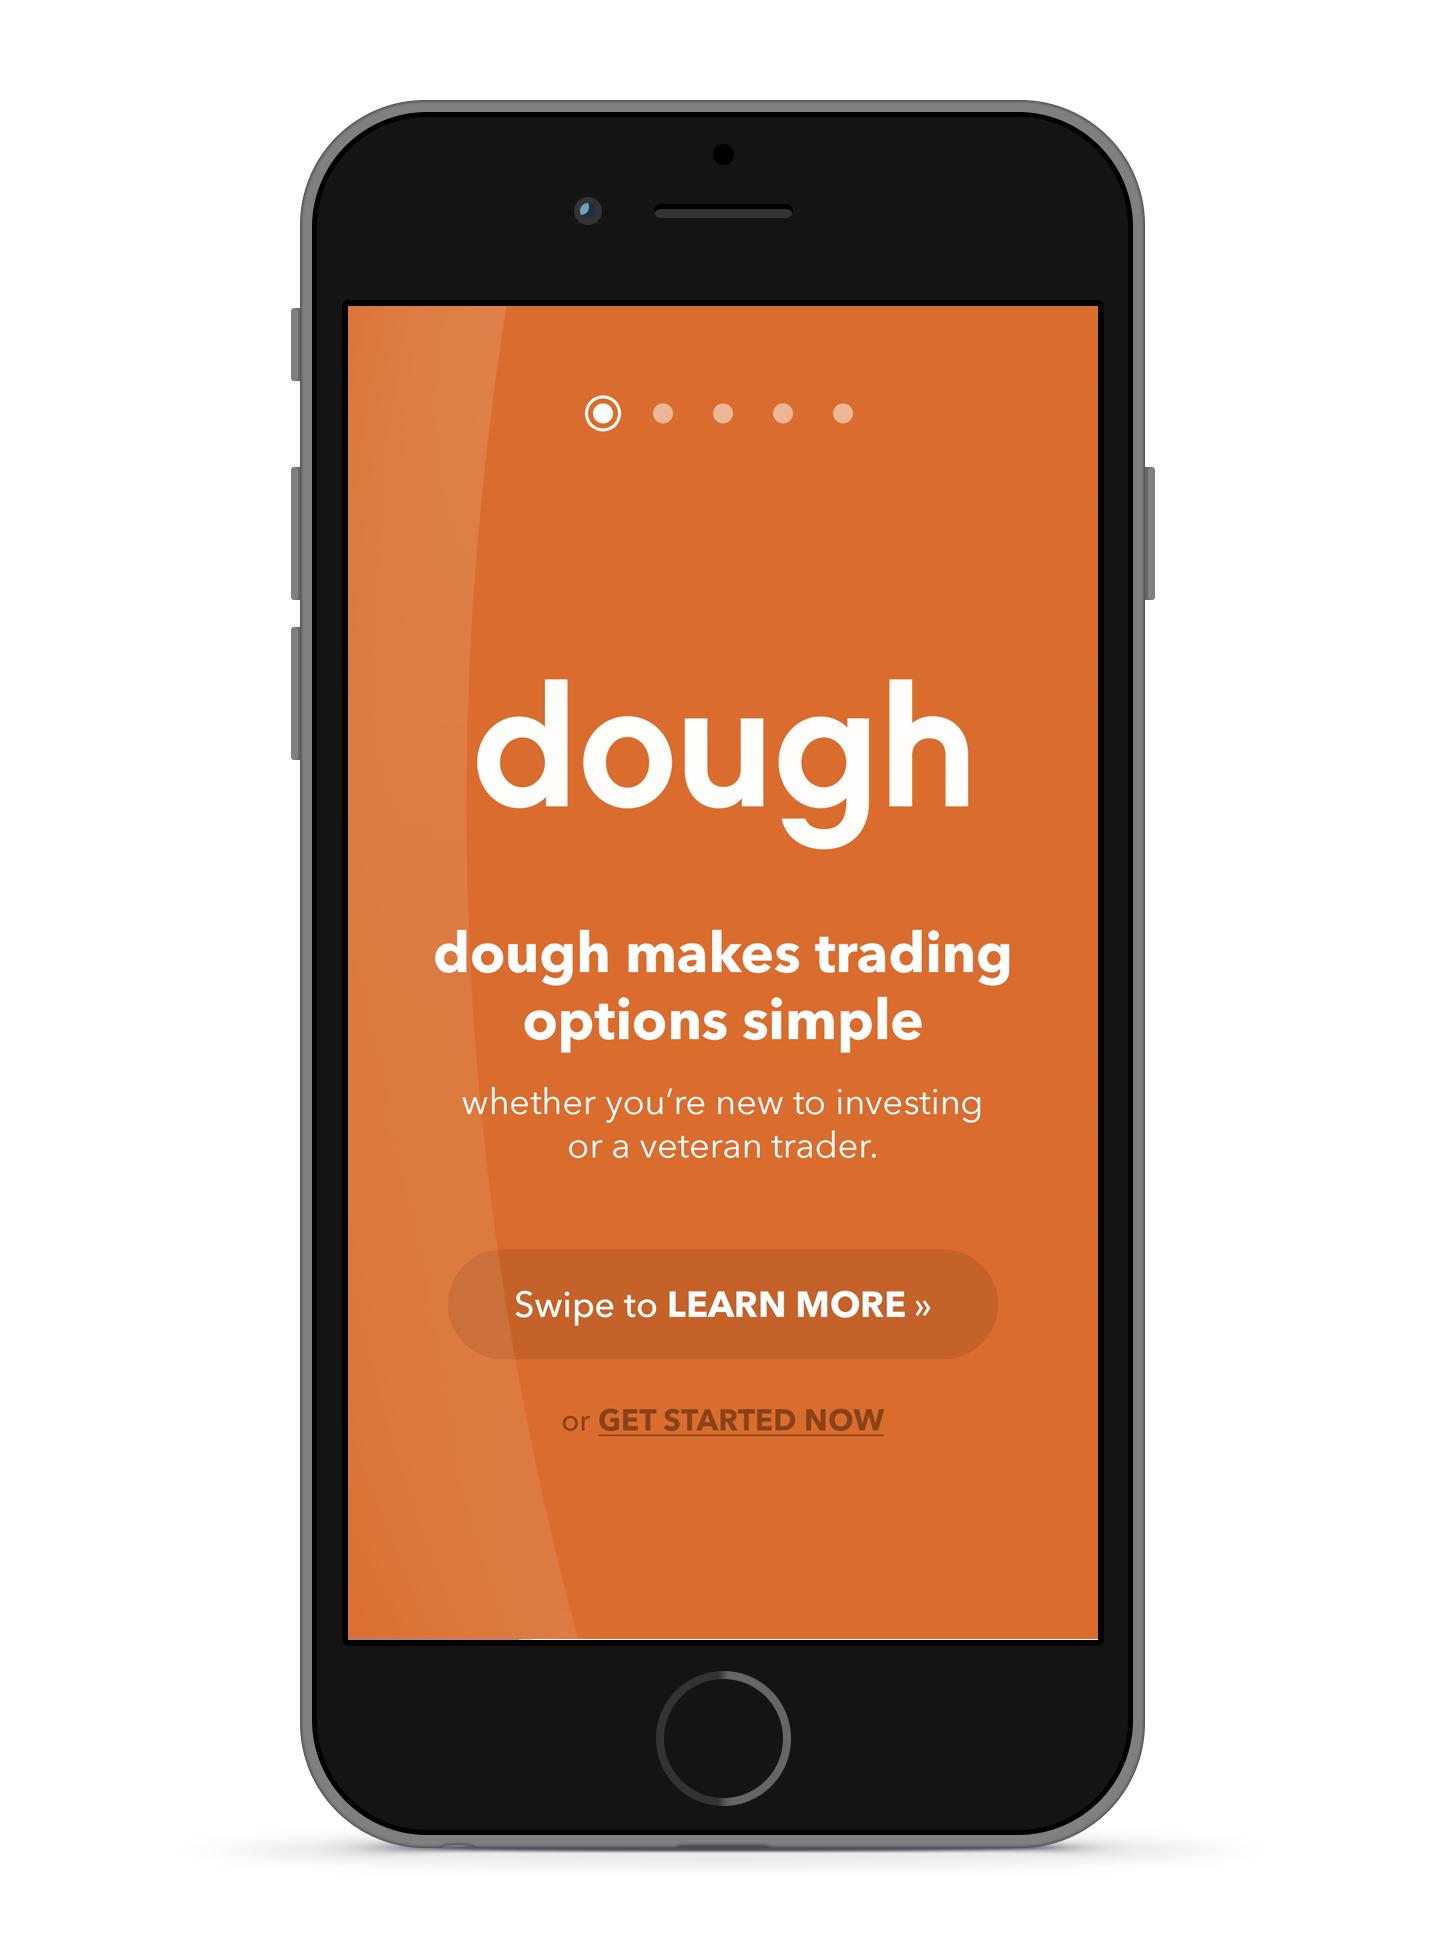 dough_walkthrough_screen_01.png